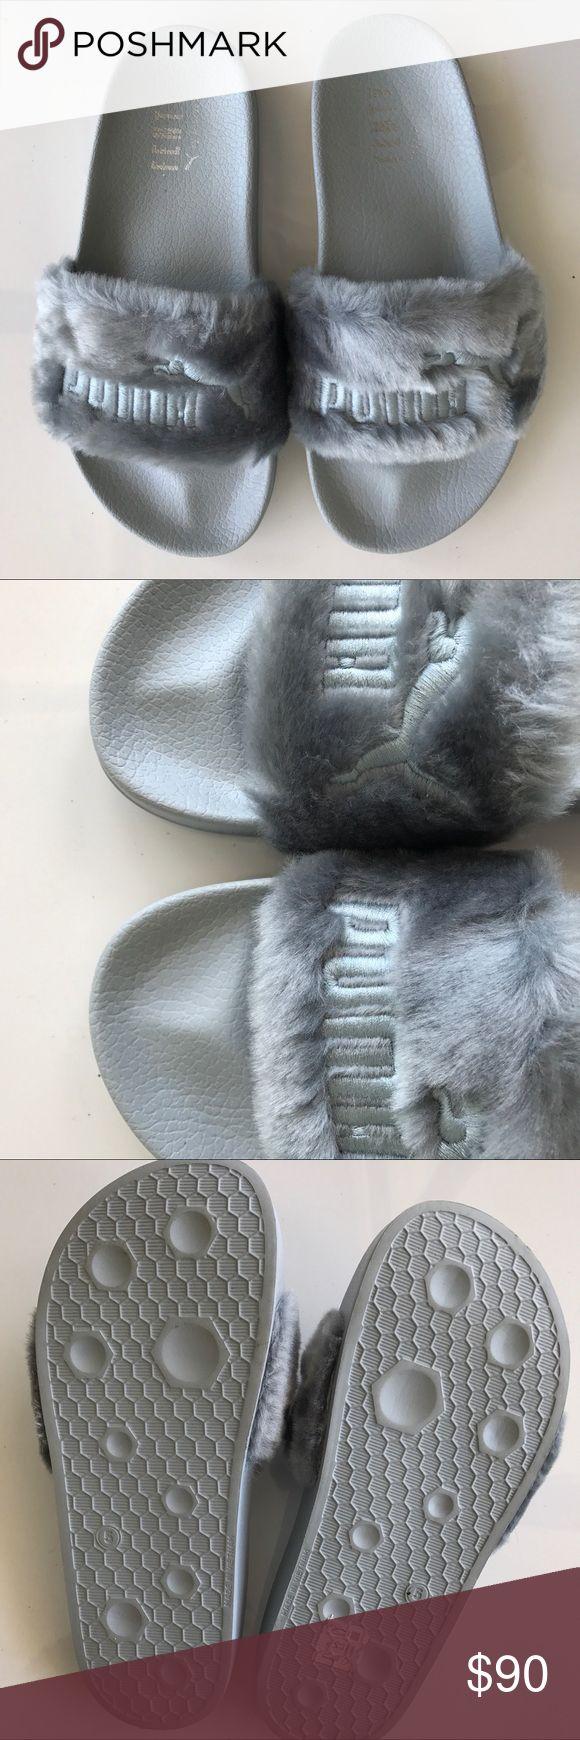 Puma x Rihanna Fenty Slides Faux Fur Gray Puma x Rihanna Fenty Slides Faux Fur Gray. Like new condition. Size 7.5. These run big. Puma Shoes Sandals